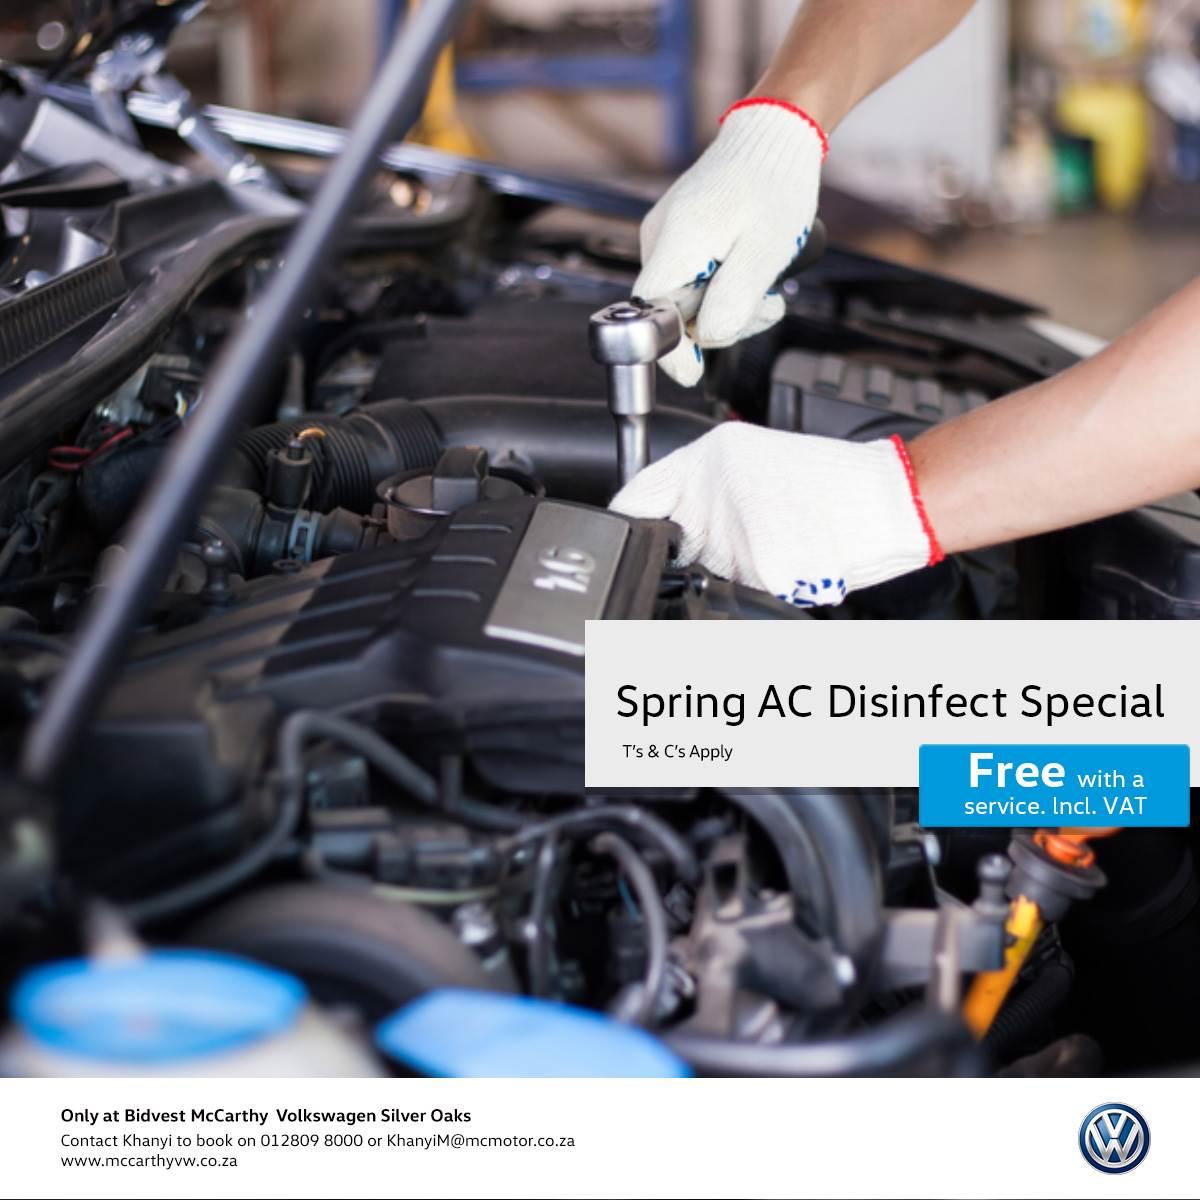 Service And Parts | Bidvest McCarthy Volkswagen